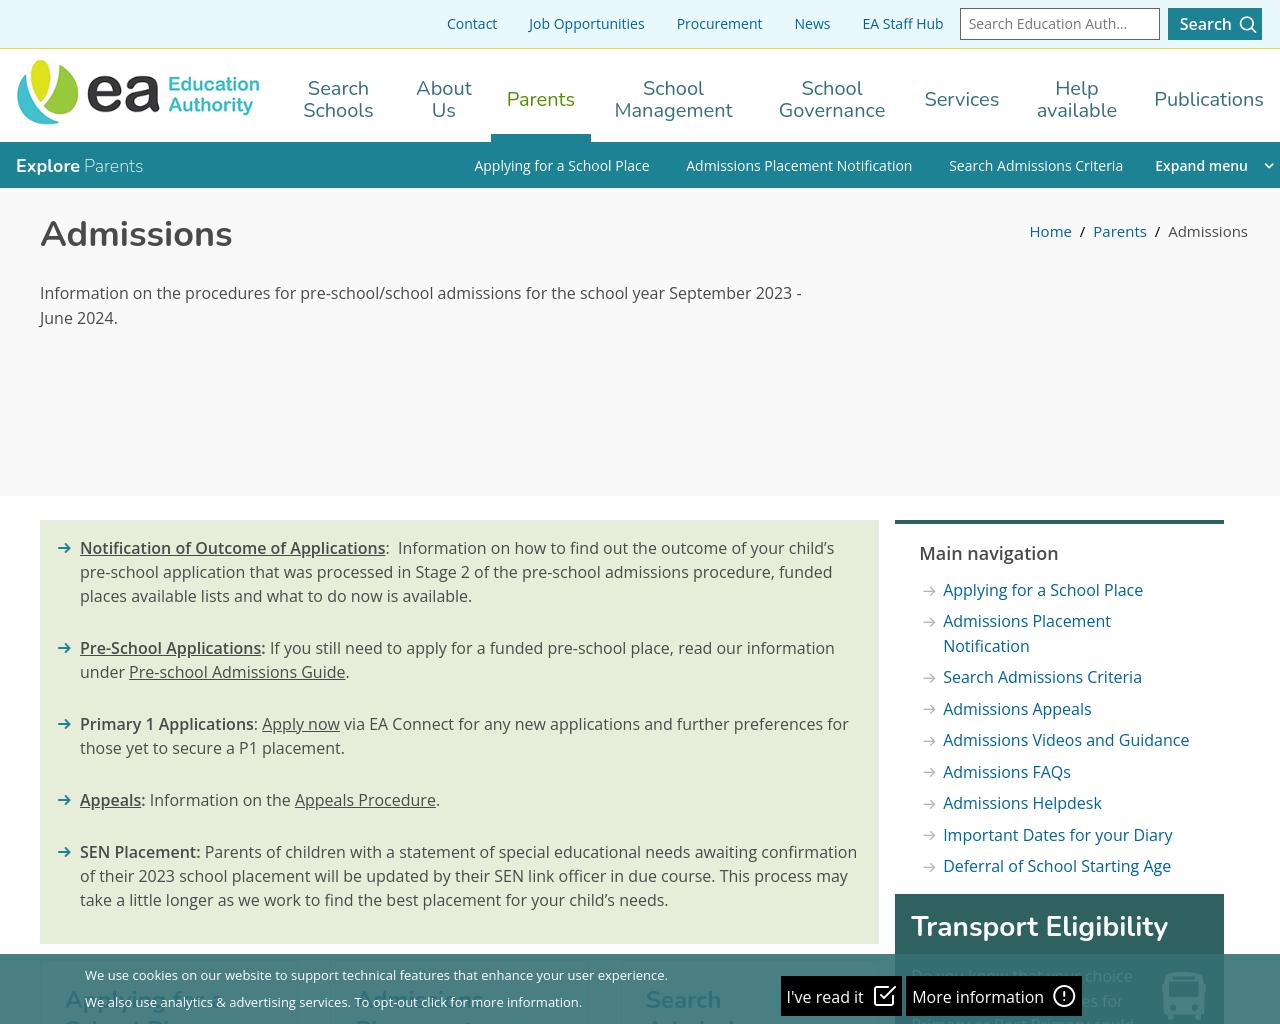 eani admissions website